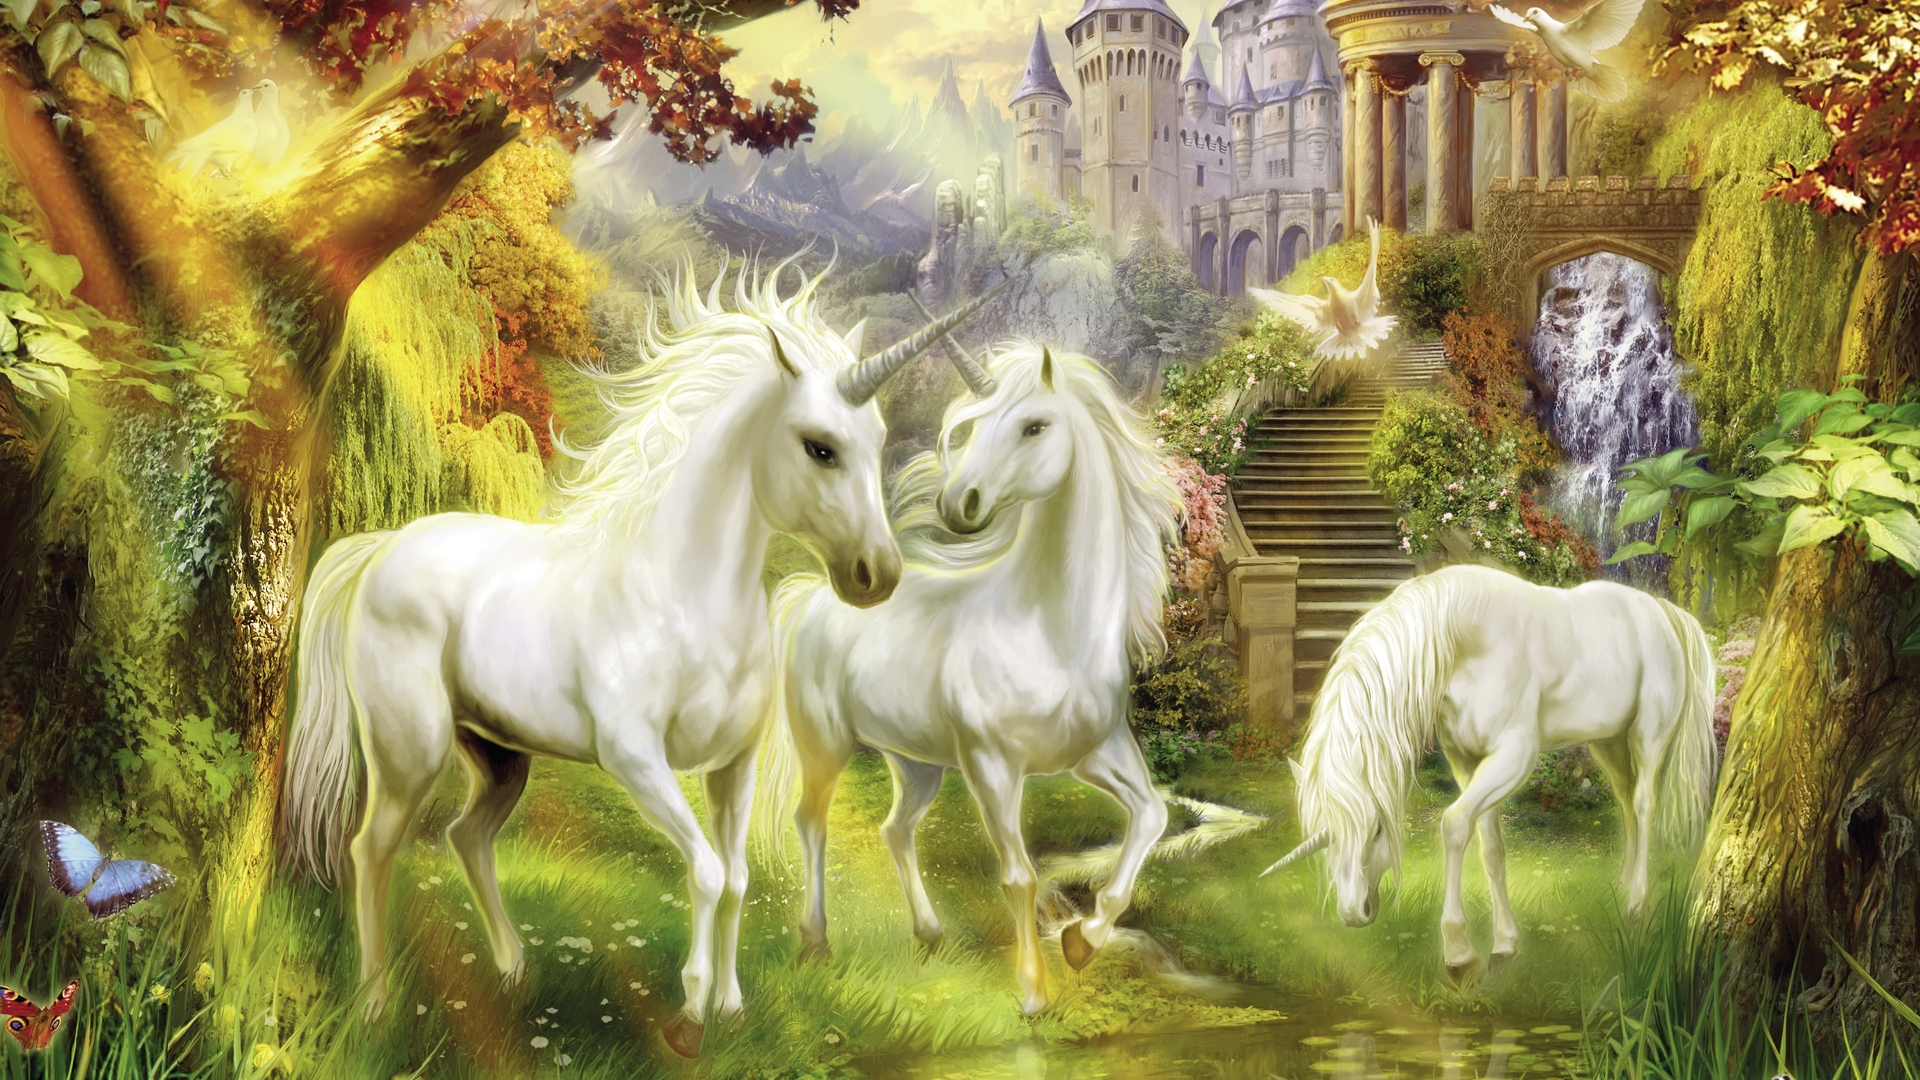 Unicorns   Wallpaper High Definition High Quality Widescreen 1920x1080